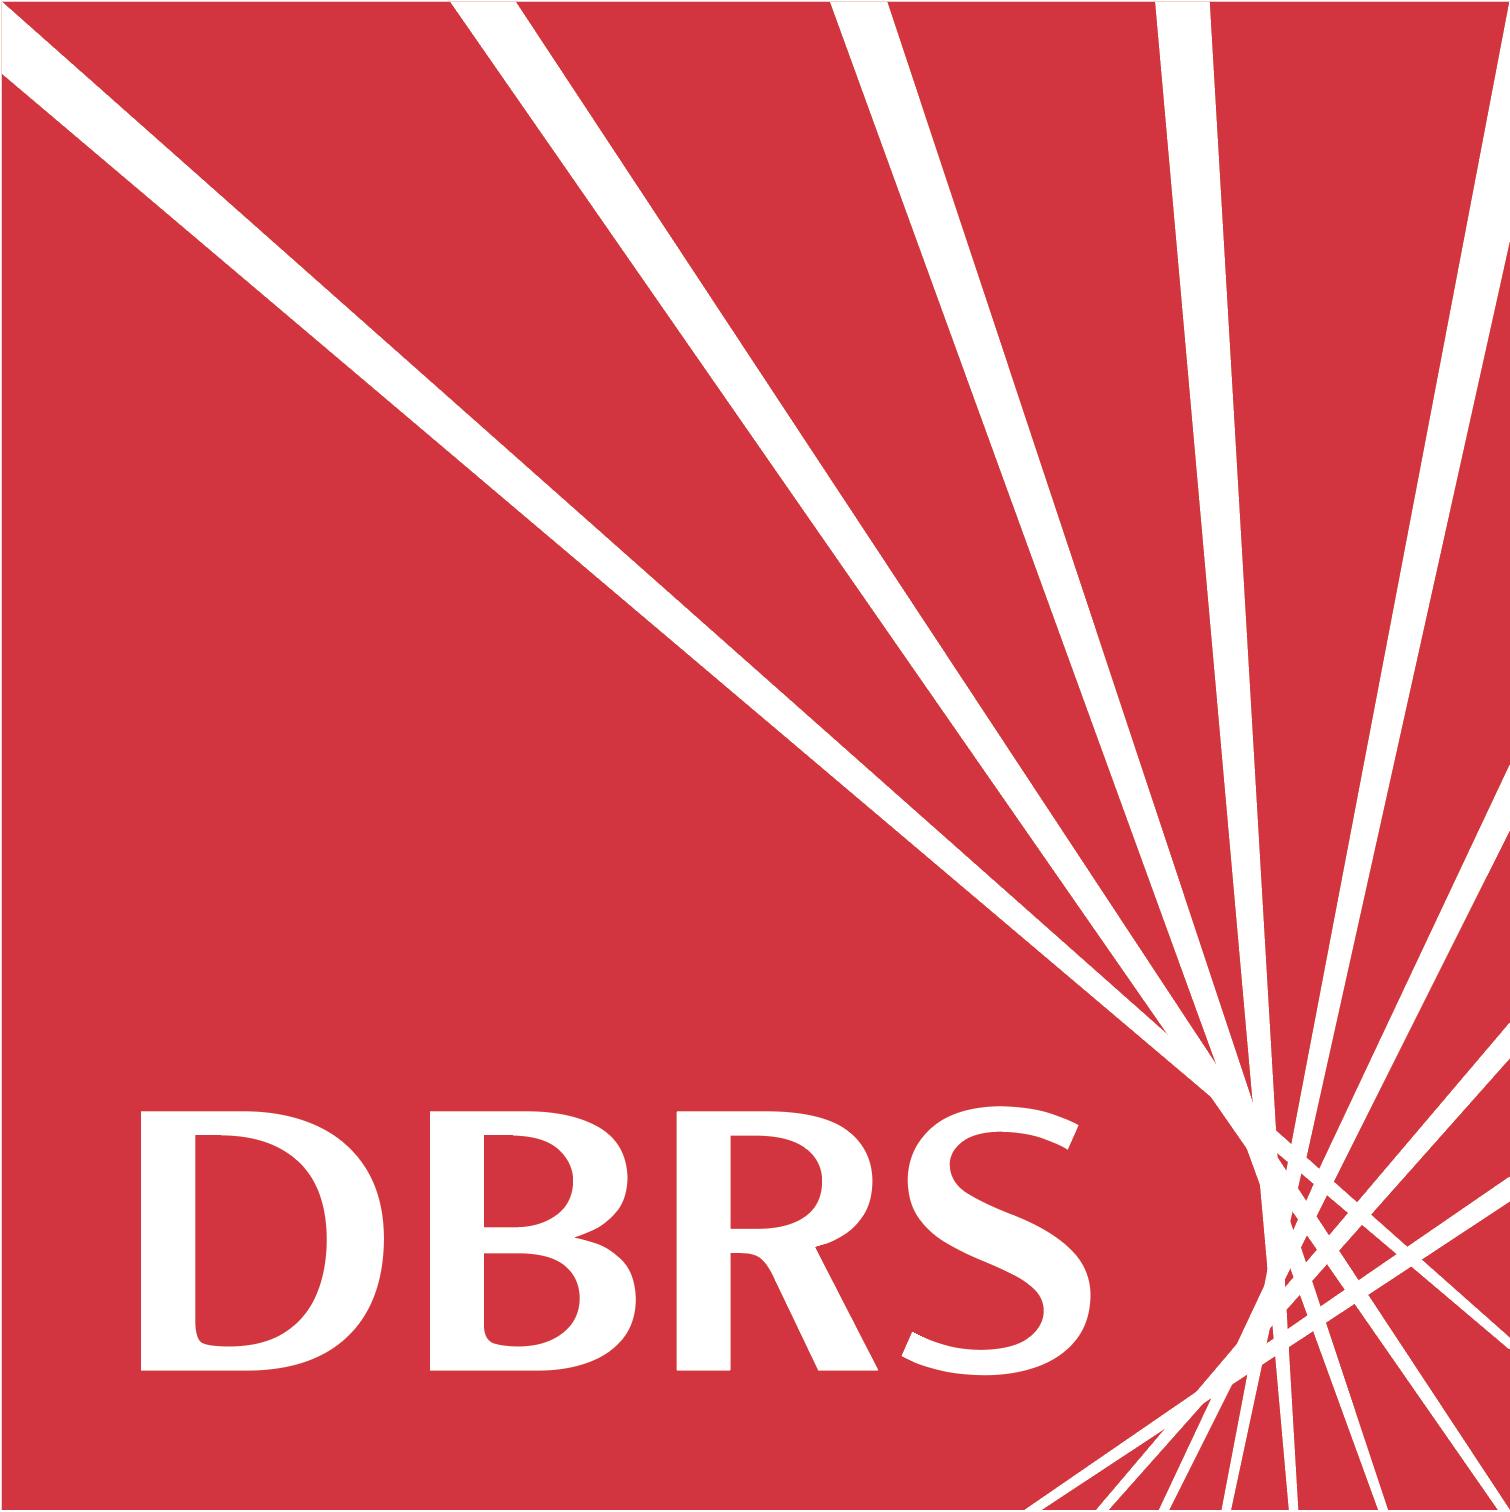 DBRS.png